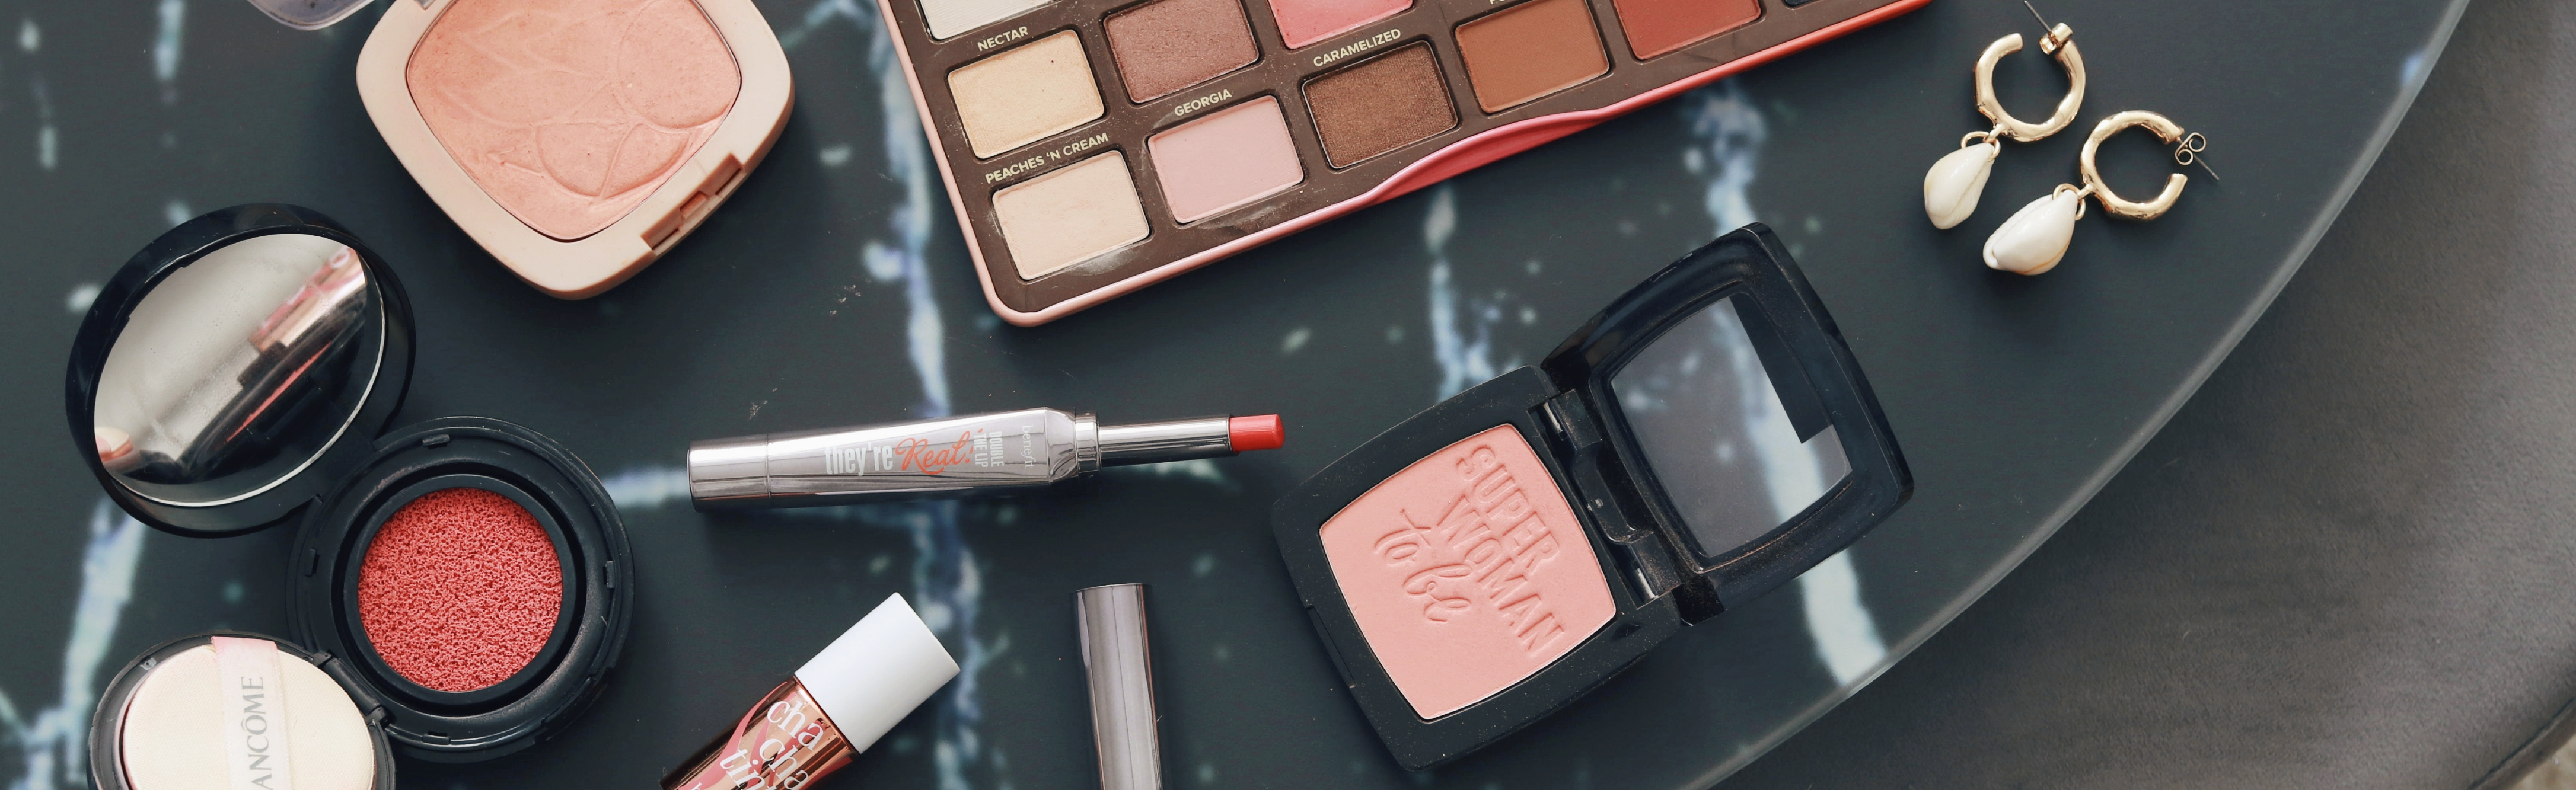 "Trendfarbe ""living coral"": Make-up Look für Rothaarige | typgerecht"